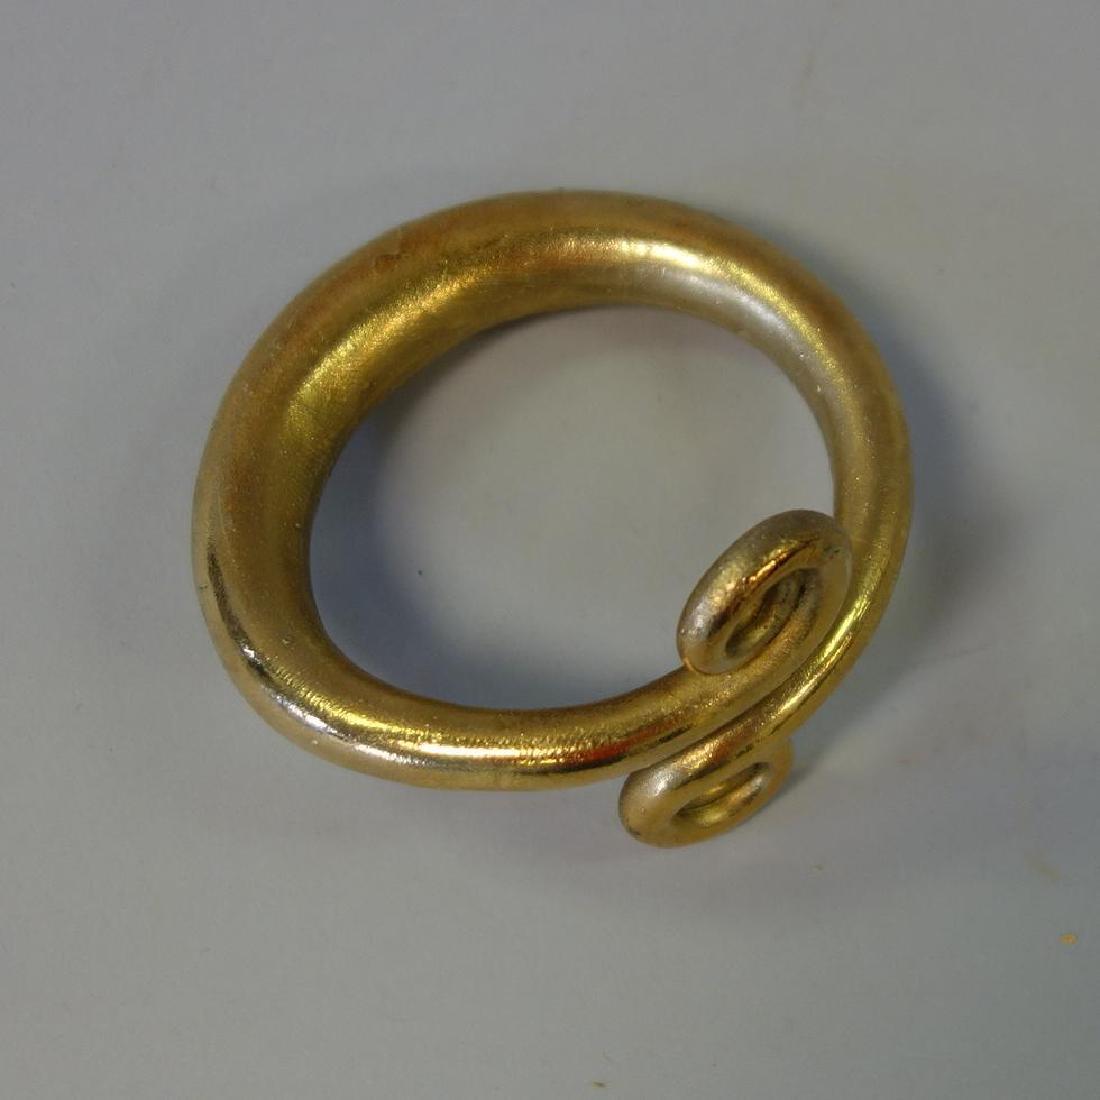 Danish Gilt Metal Cuff Bracelet, Signed Jan - 3